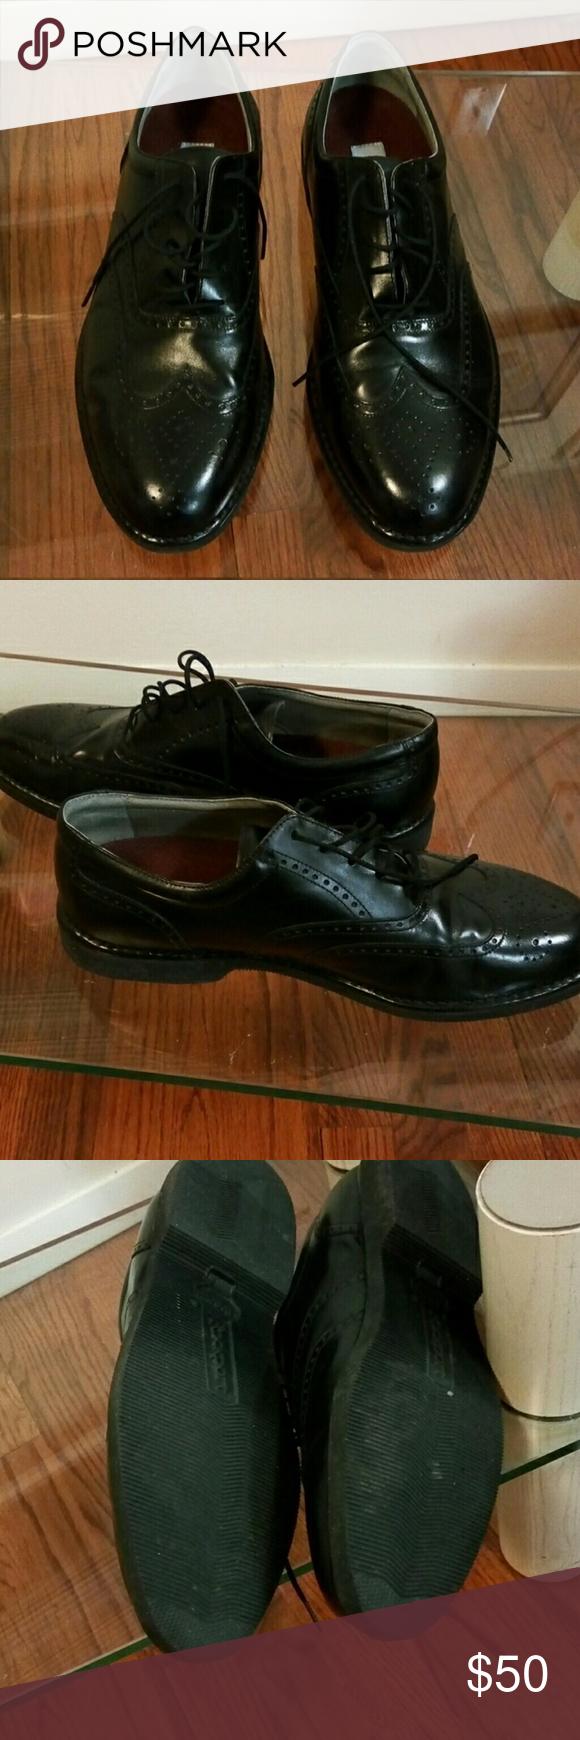 Men's Black Leather Rockport Lace Up Shoes Size 10.5 Wide Rockport Shoes Oxfords & Derbys